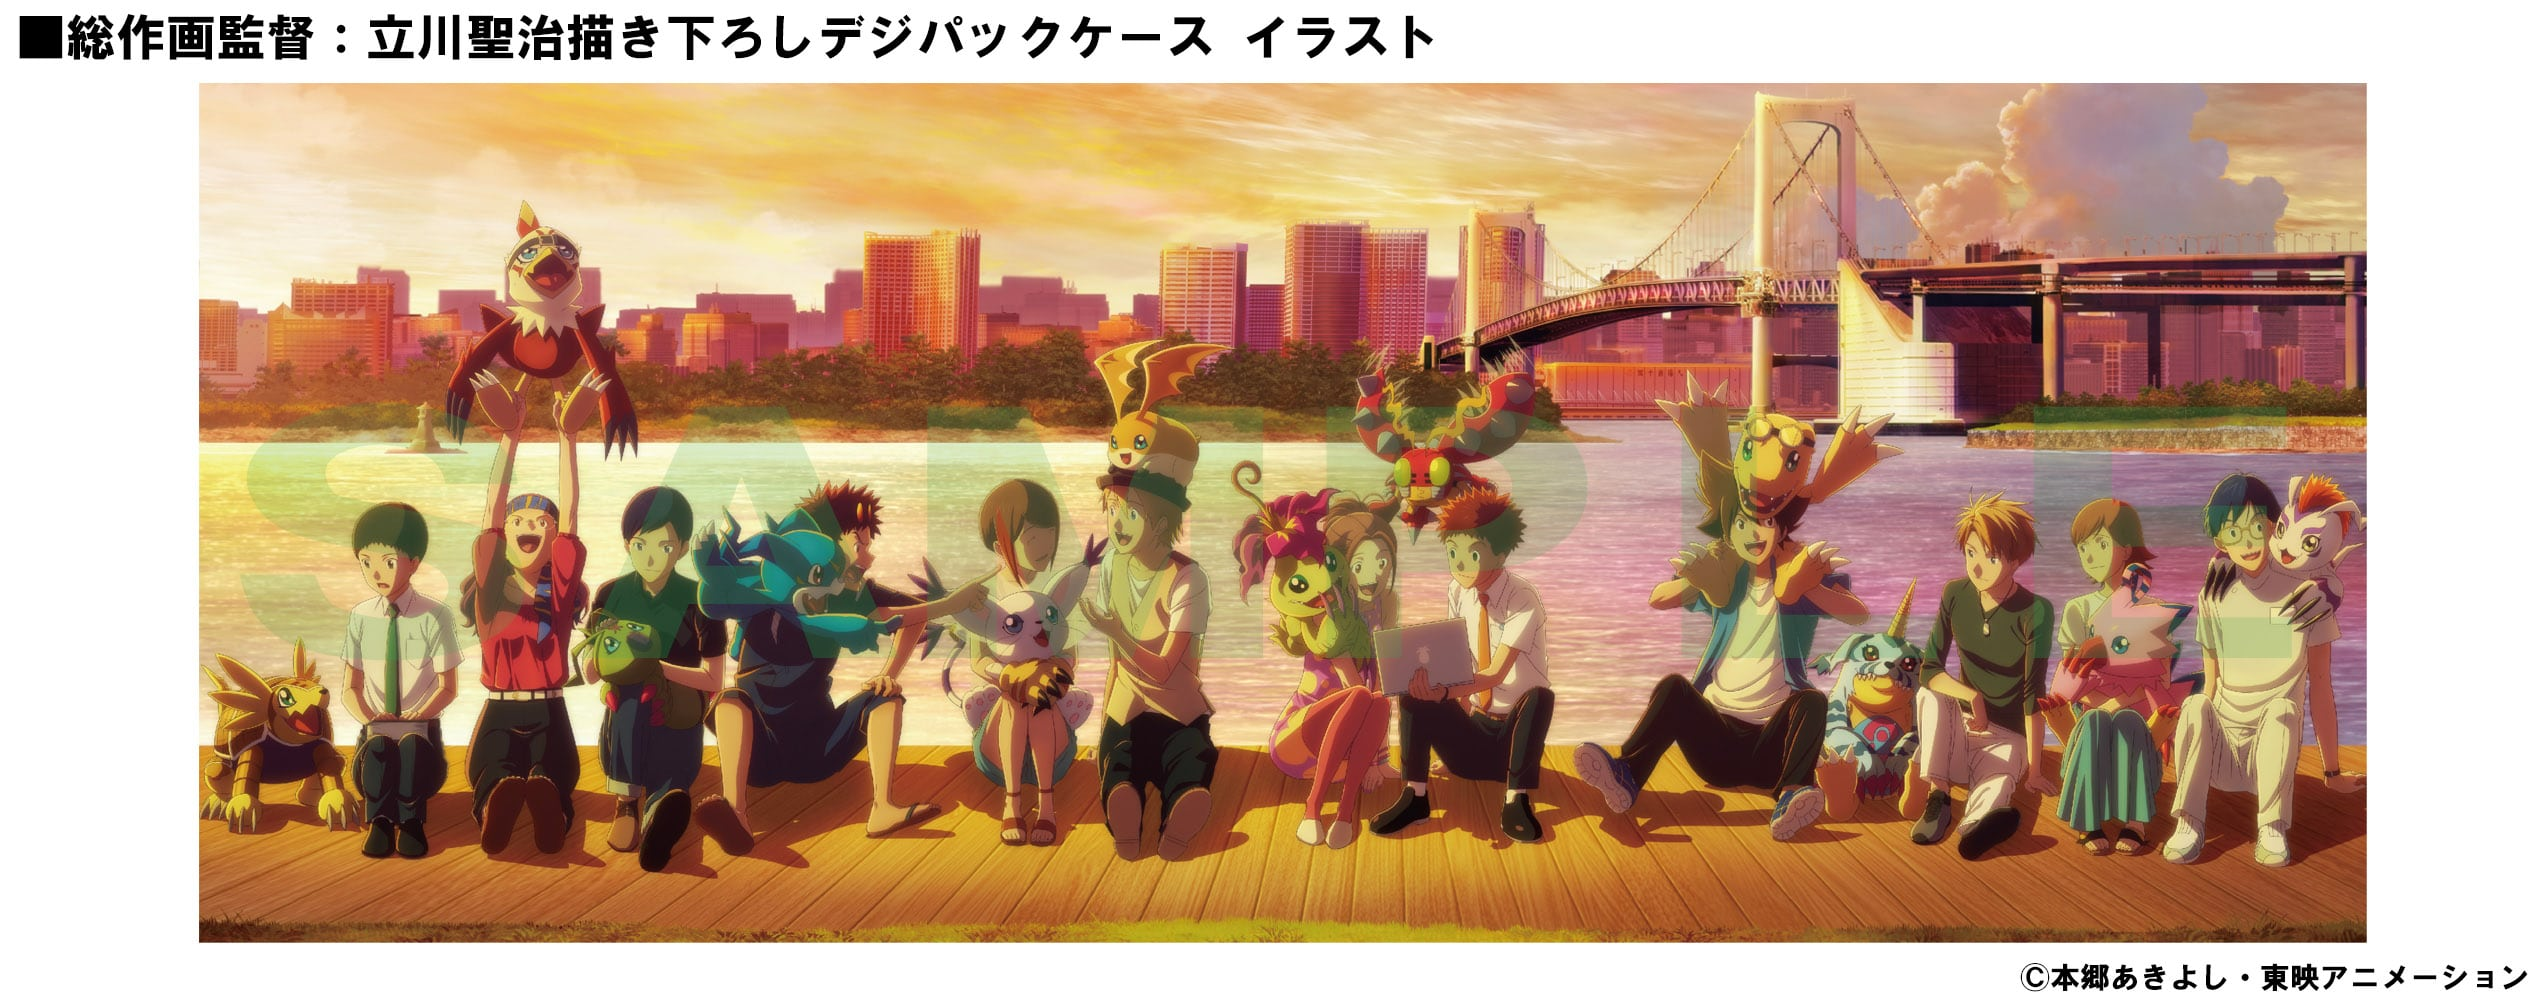 Photo of Anuncian BluRay & DVD para Digimon Adventure LAST EVOLUTION Kizuna + Nuevo CD drama